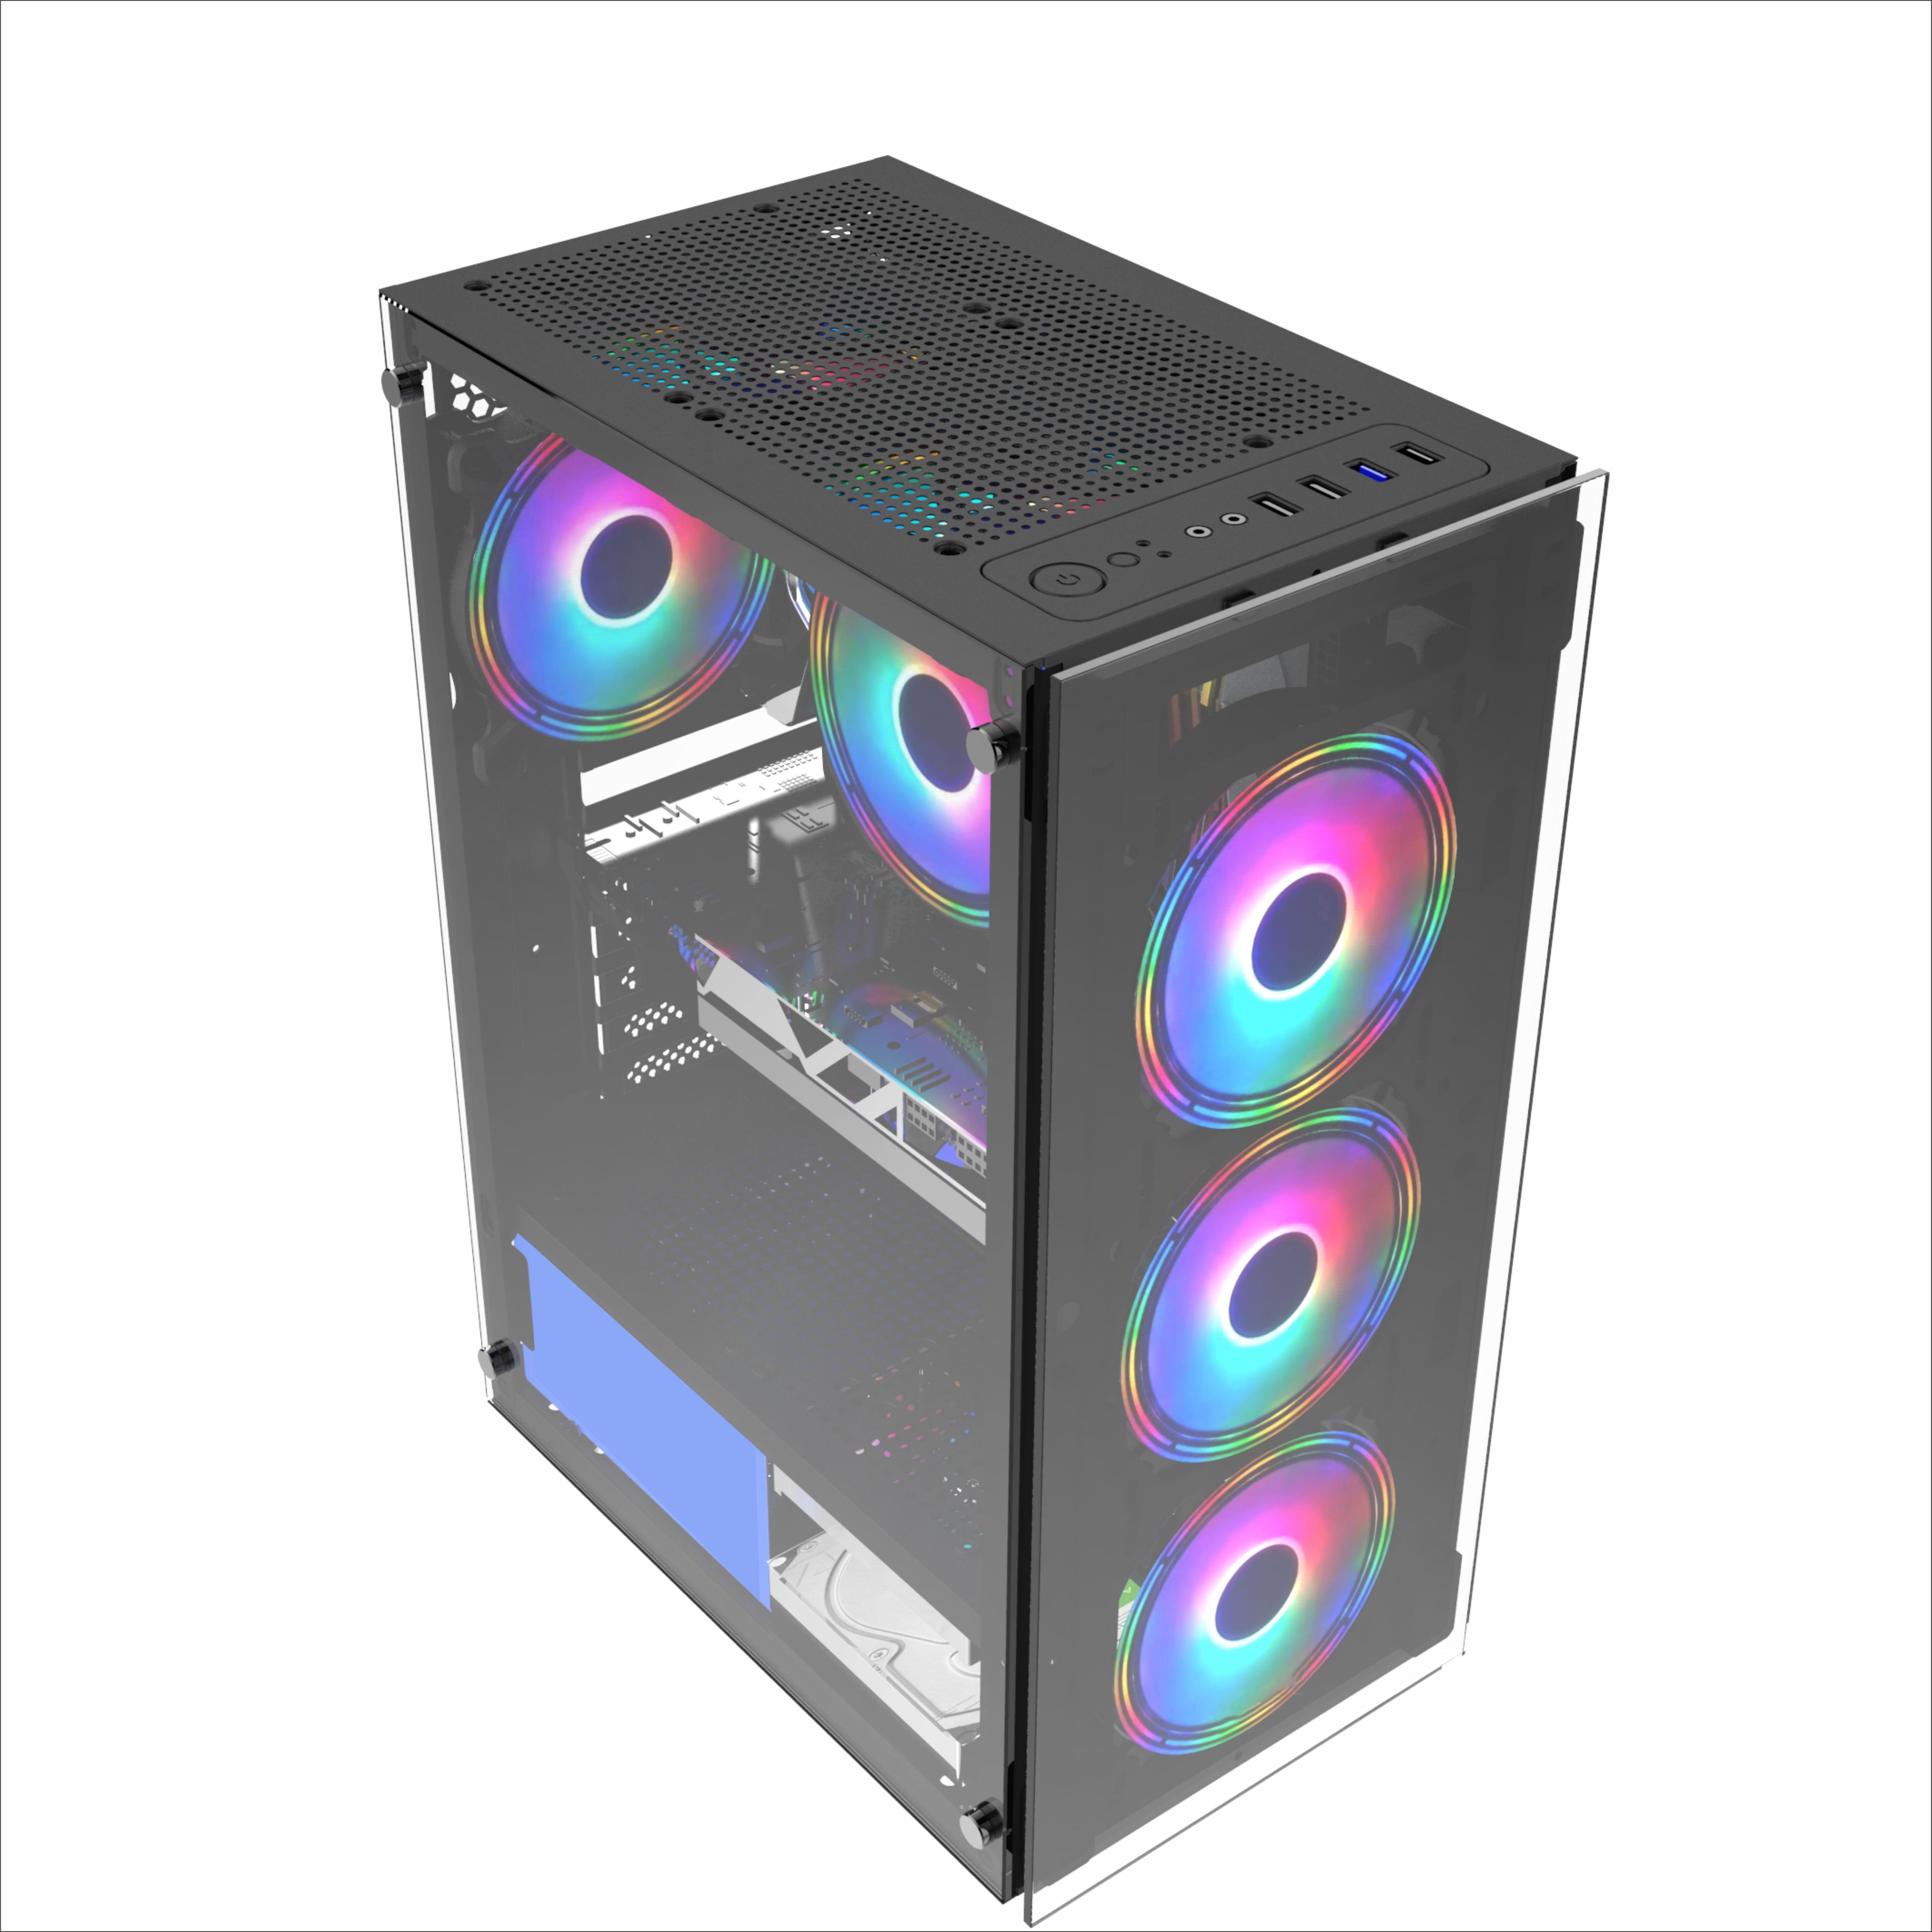 Intel Xeon E5-2660 16GB RAM SSD HDD GTX 1050 6GB Grafikkarten system Einheit Desktop-Gaming-Computer PC